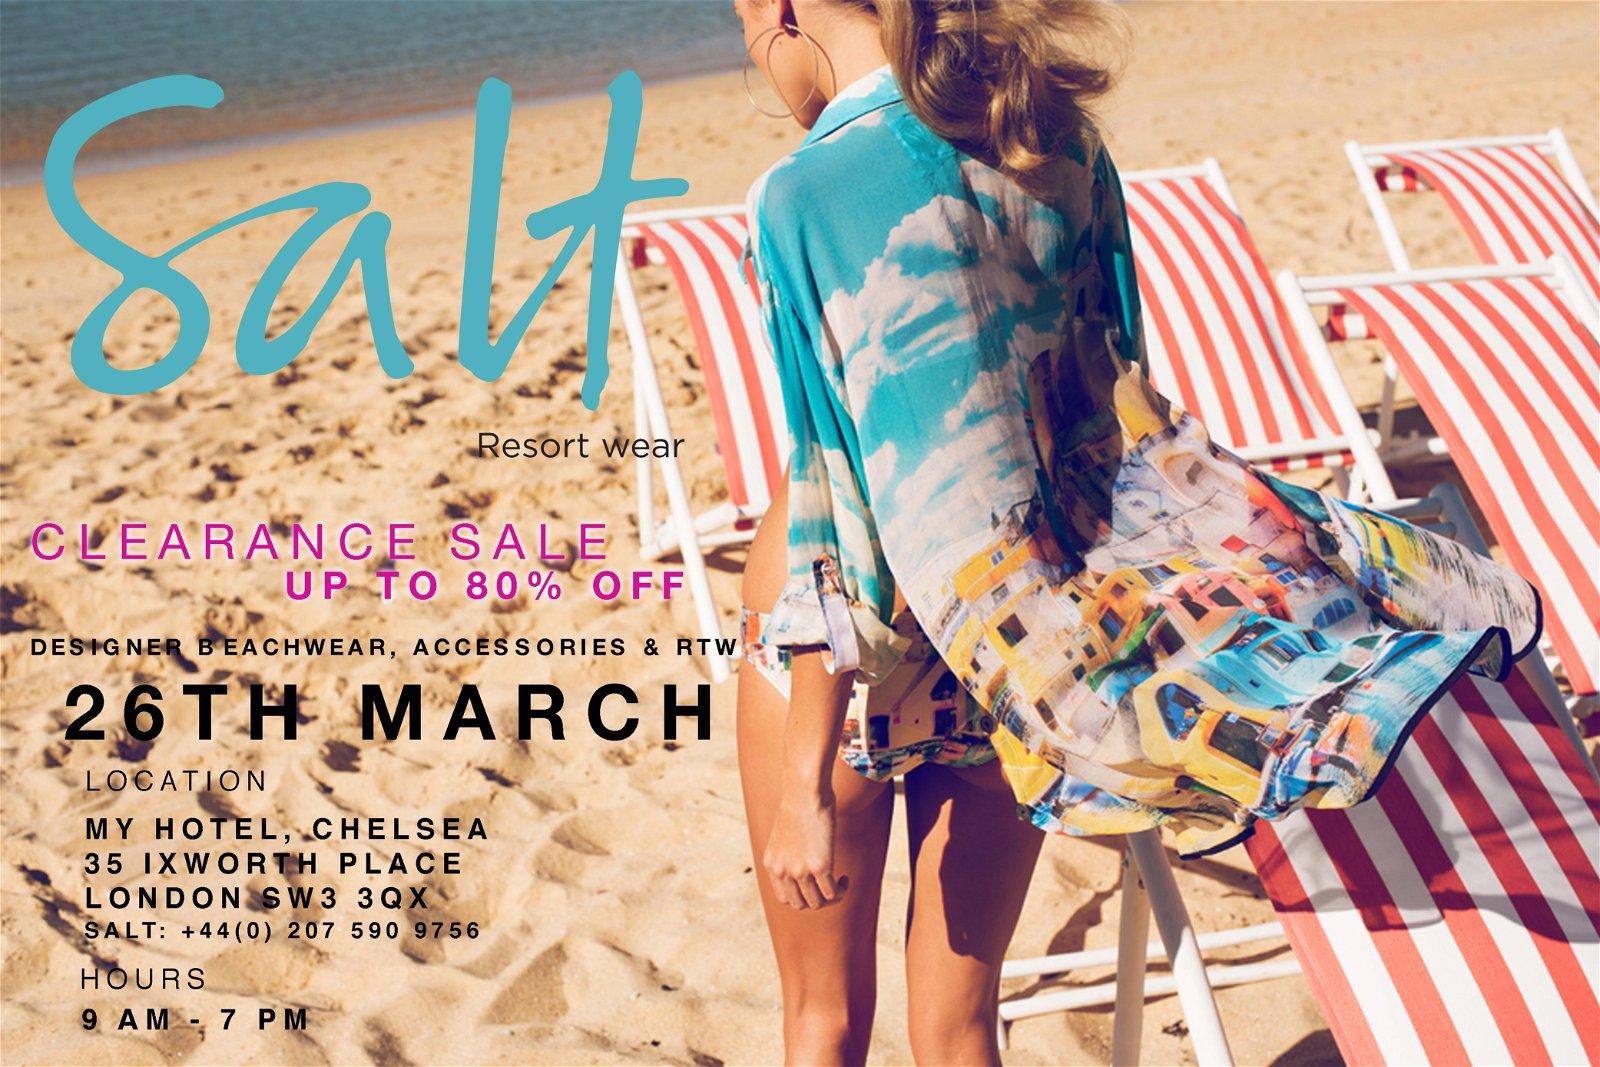 End of Season sale - Up to 50% off at Salt Resort Wear